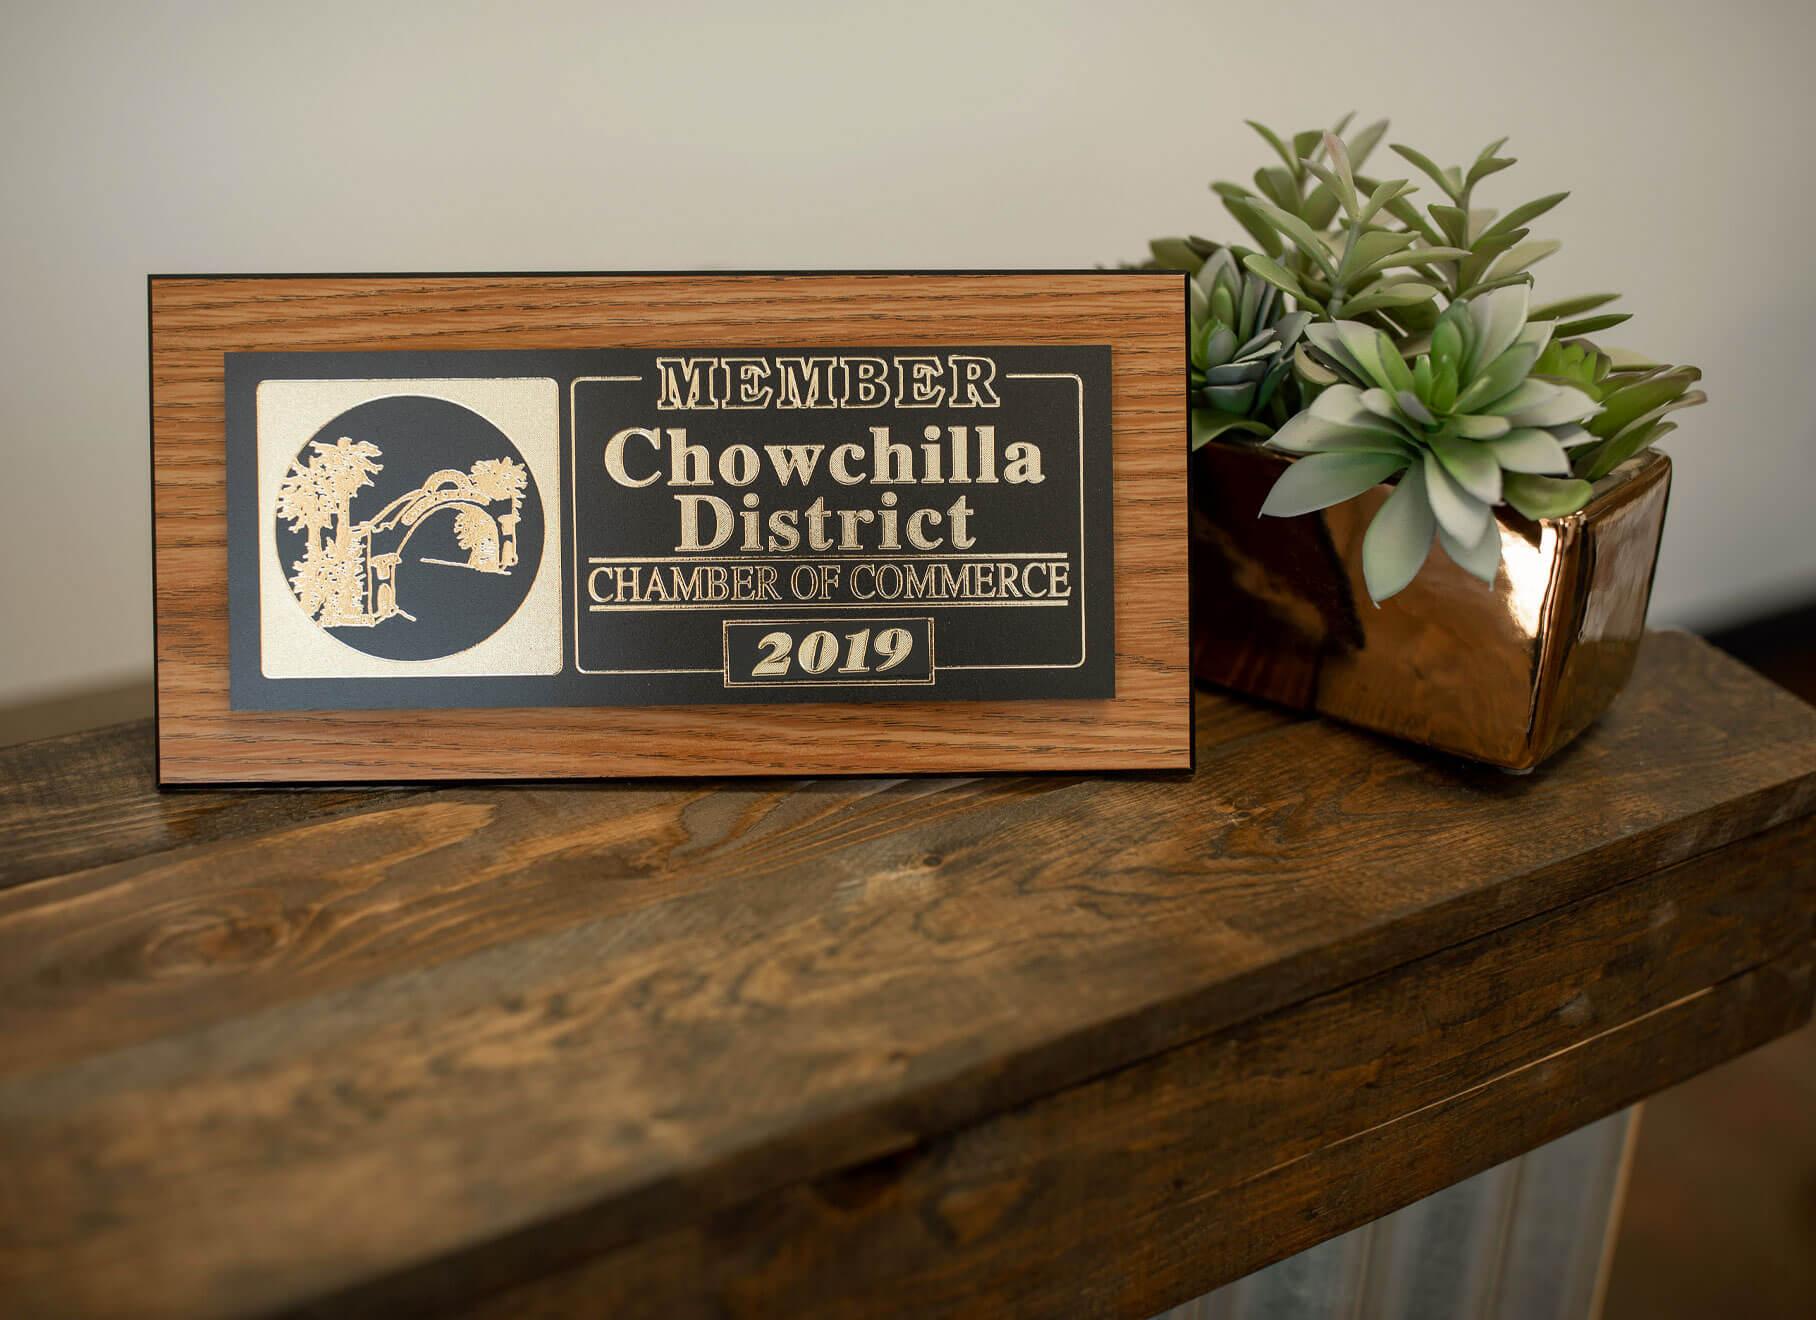 Chowchilla Chamber of Commerce - Farmcom Real Estate